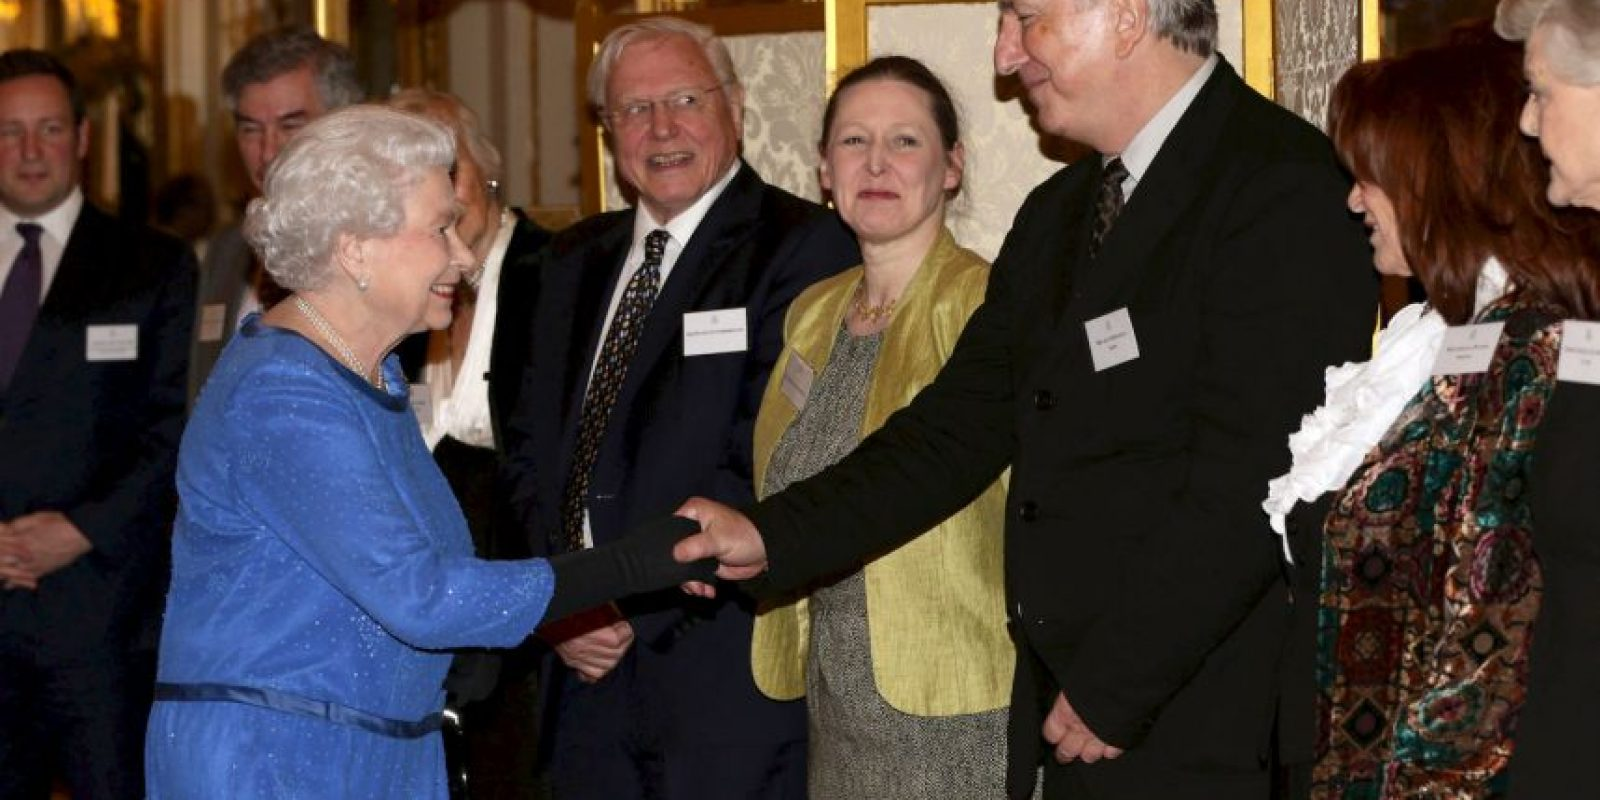 2014, con la Reina Elizabeth II Foto:Getty Images